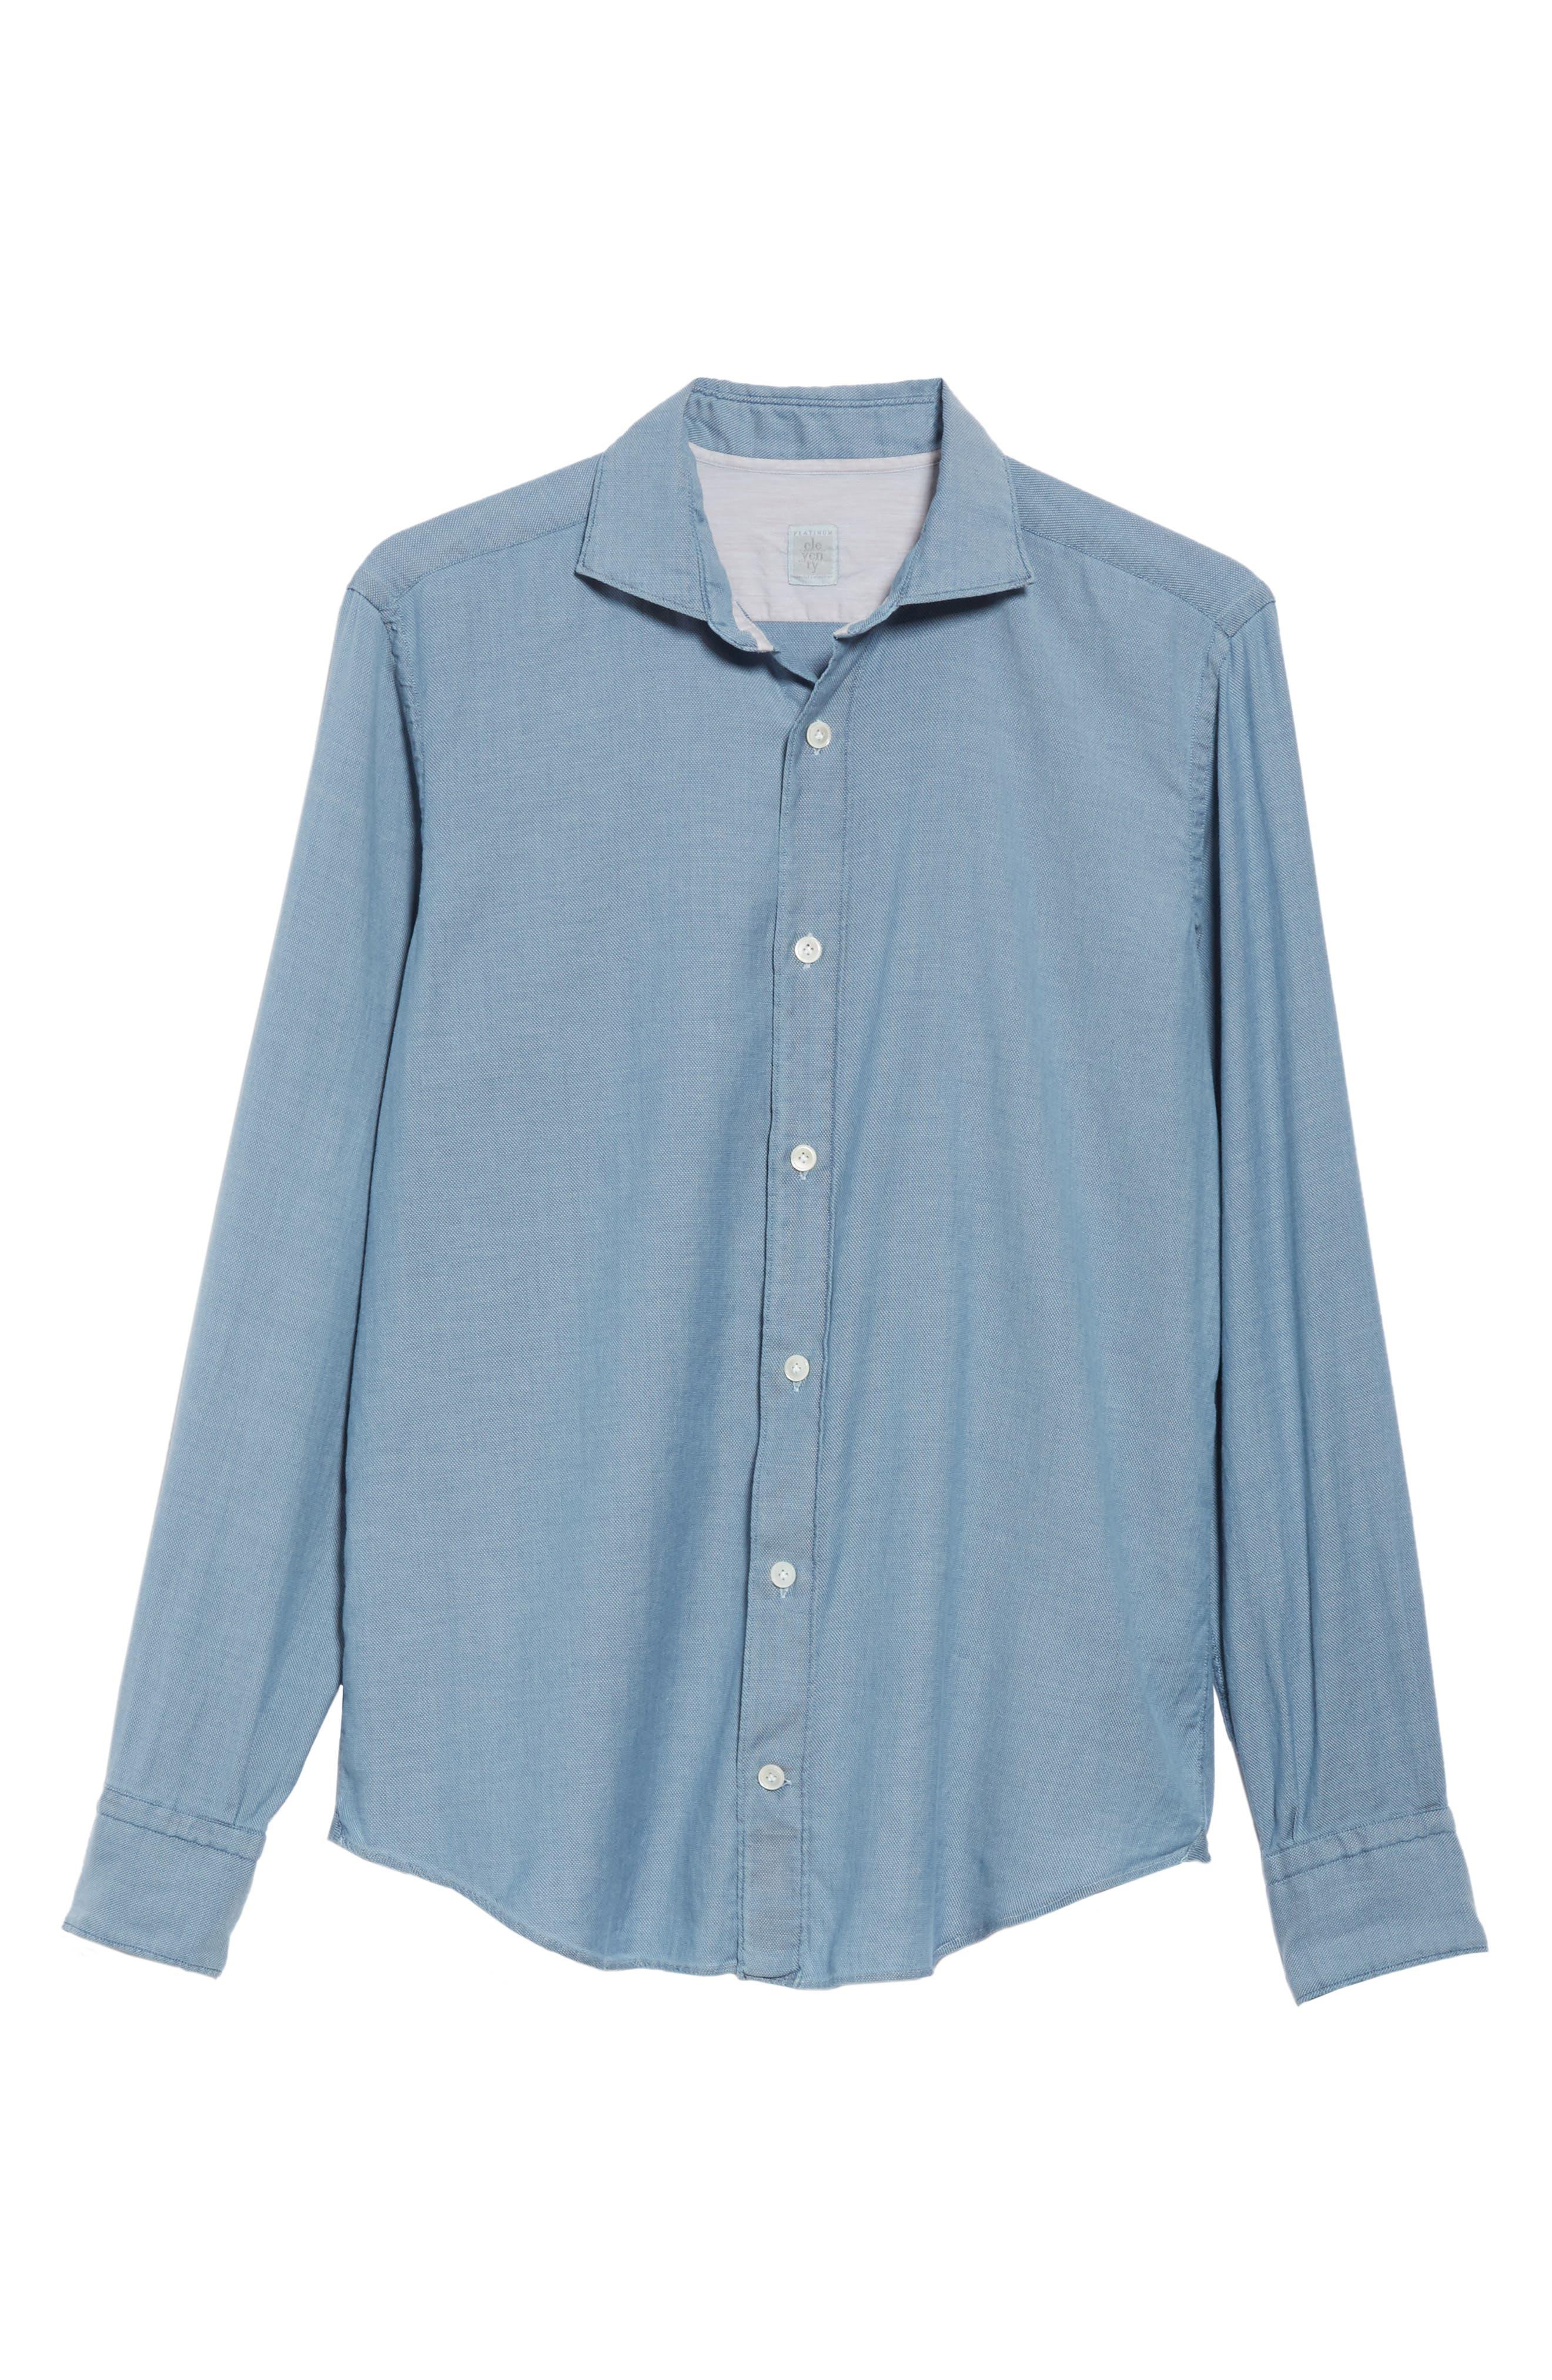 ELEVENTY,                             Trim Fit Stretch Solid Sport Shirt,                             Alternate thumbnail 5, color,                             DENIM